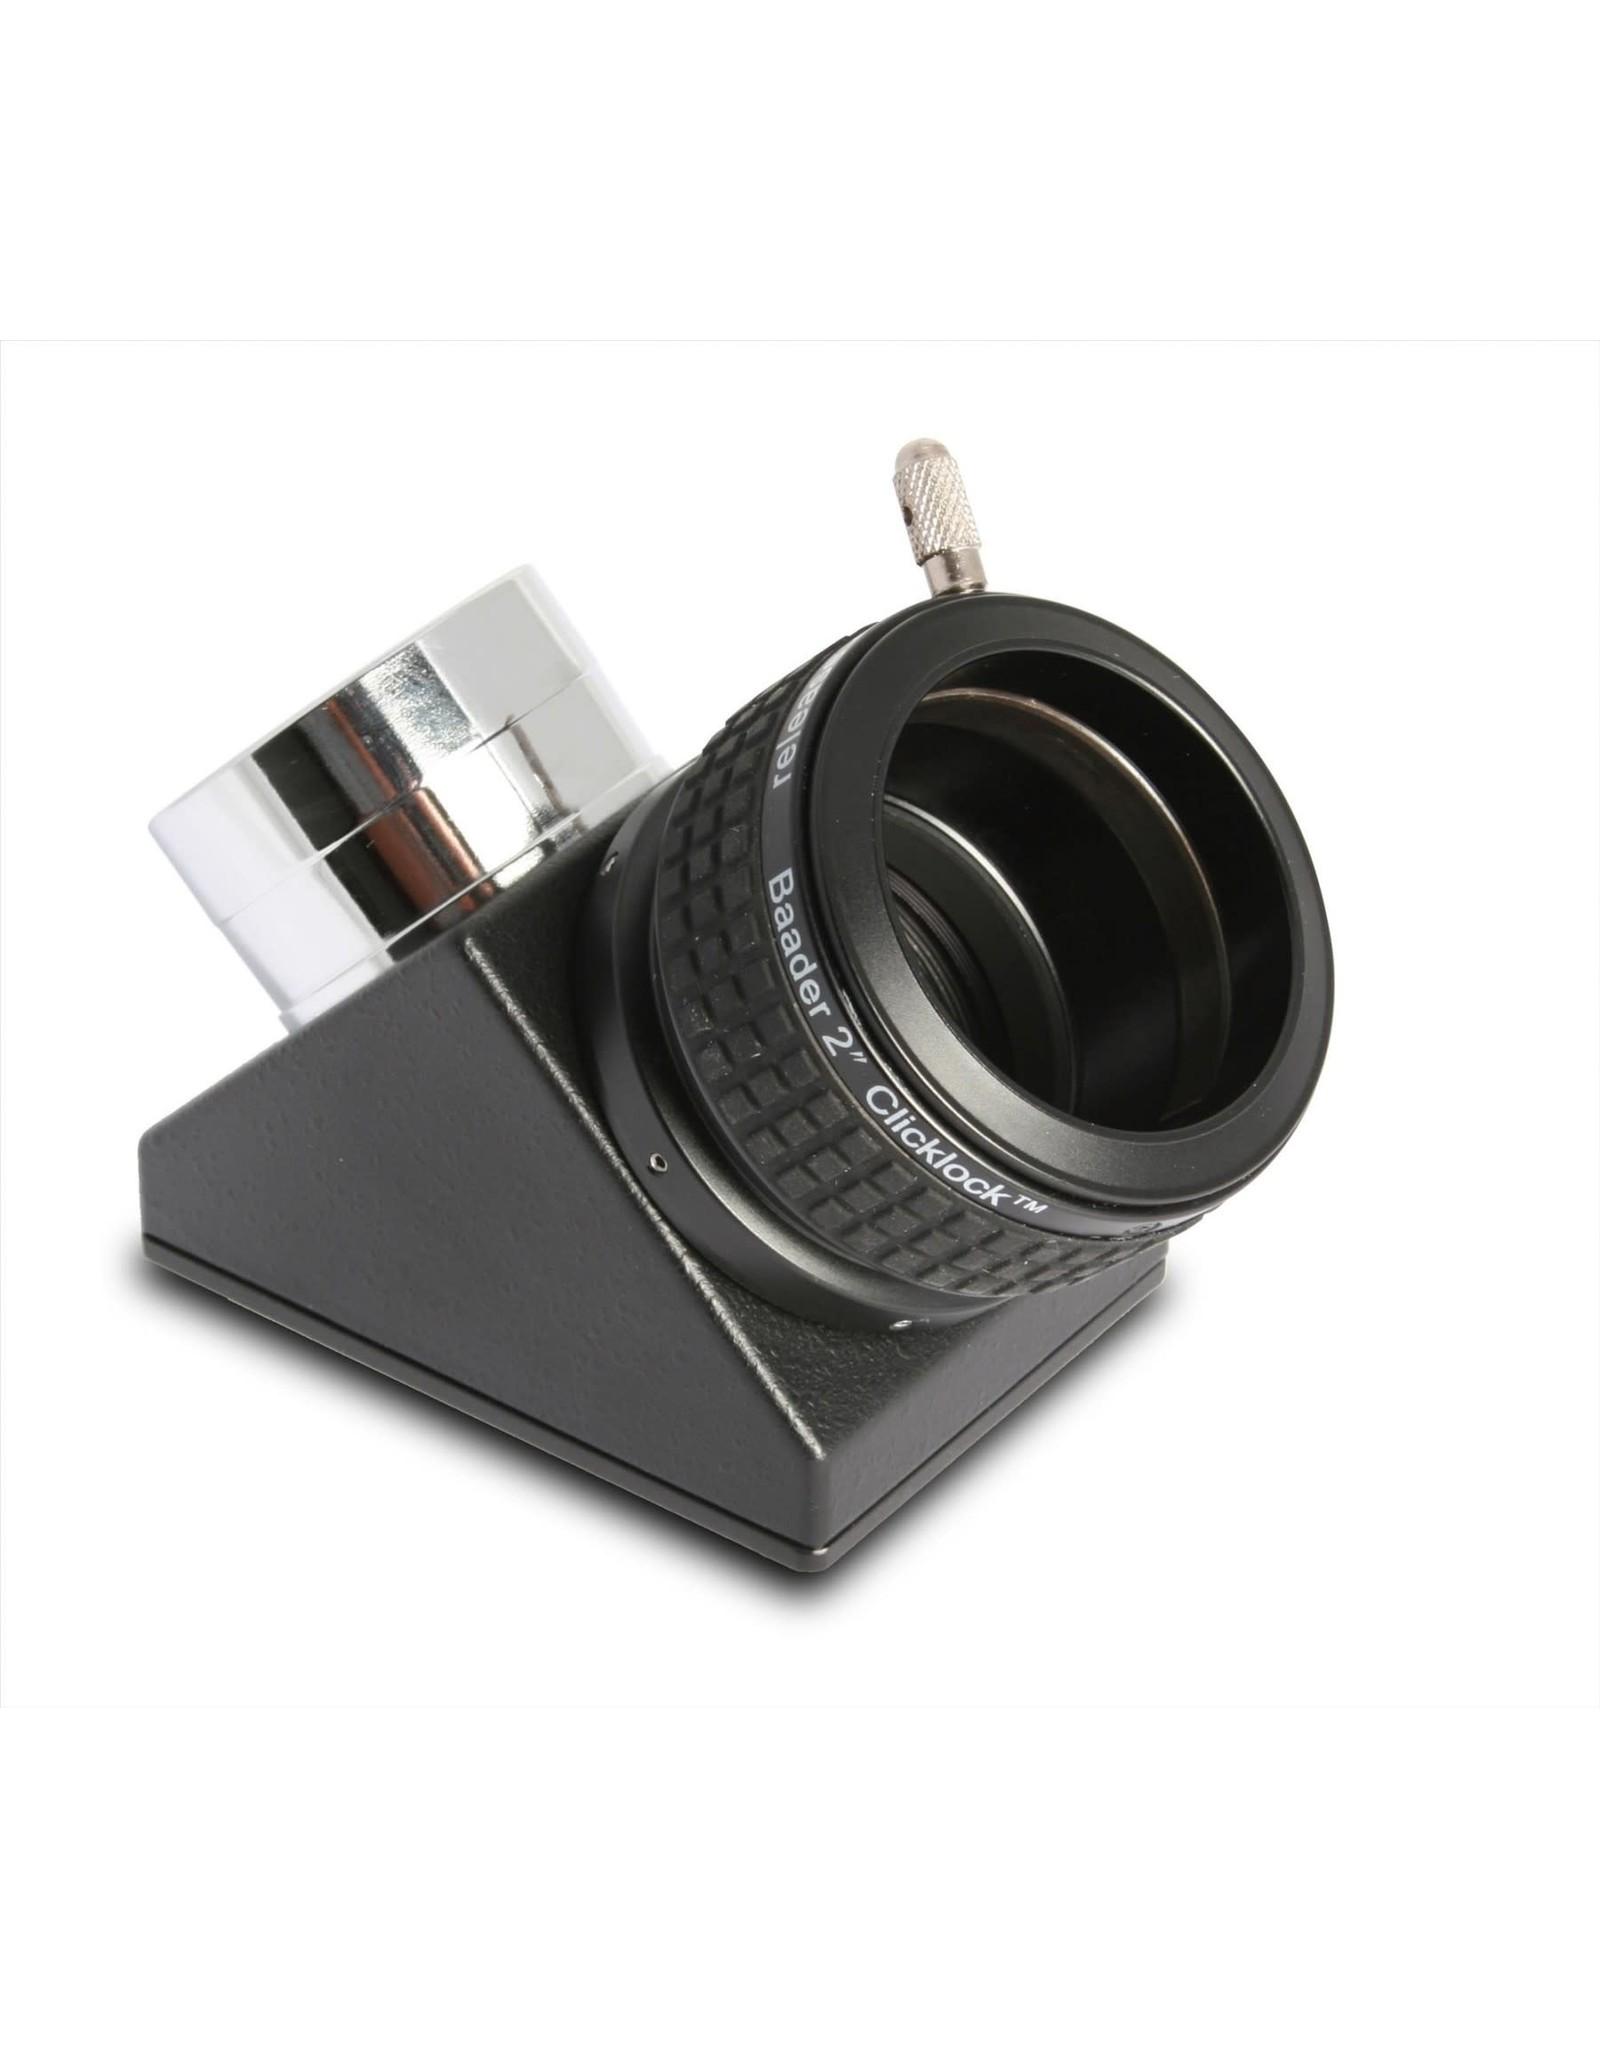 "Baader Planetarium Baader 2"" Clicklock Eyepiece Clamp for SCT (2"" Thread) SC-Clamp"